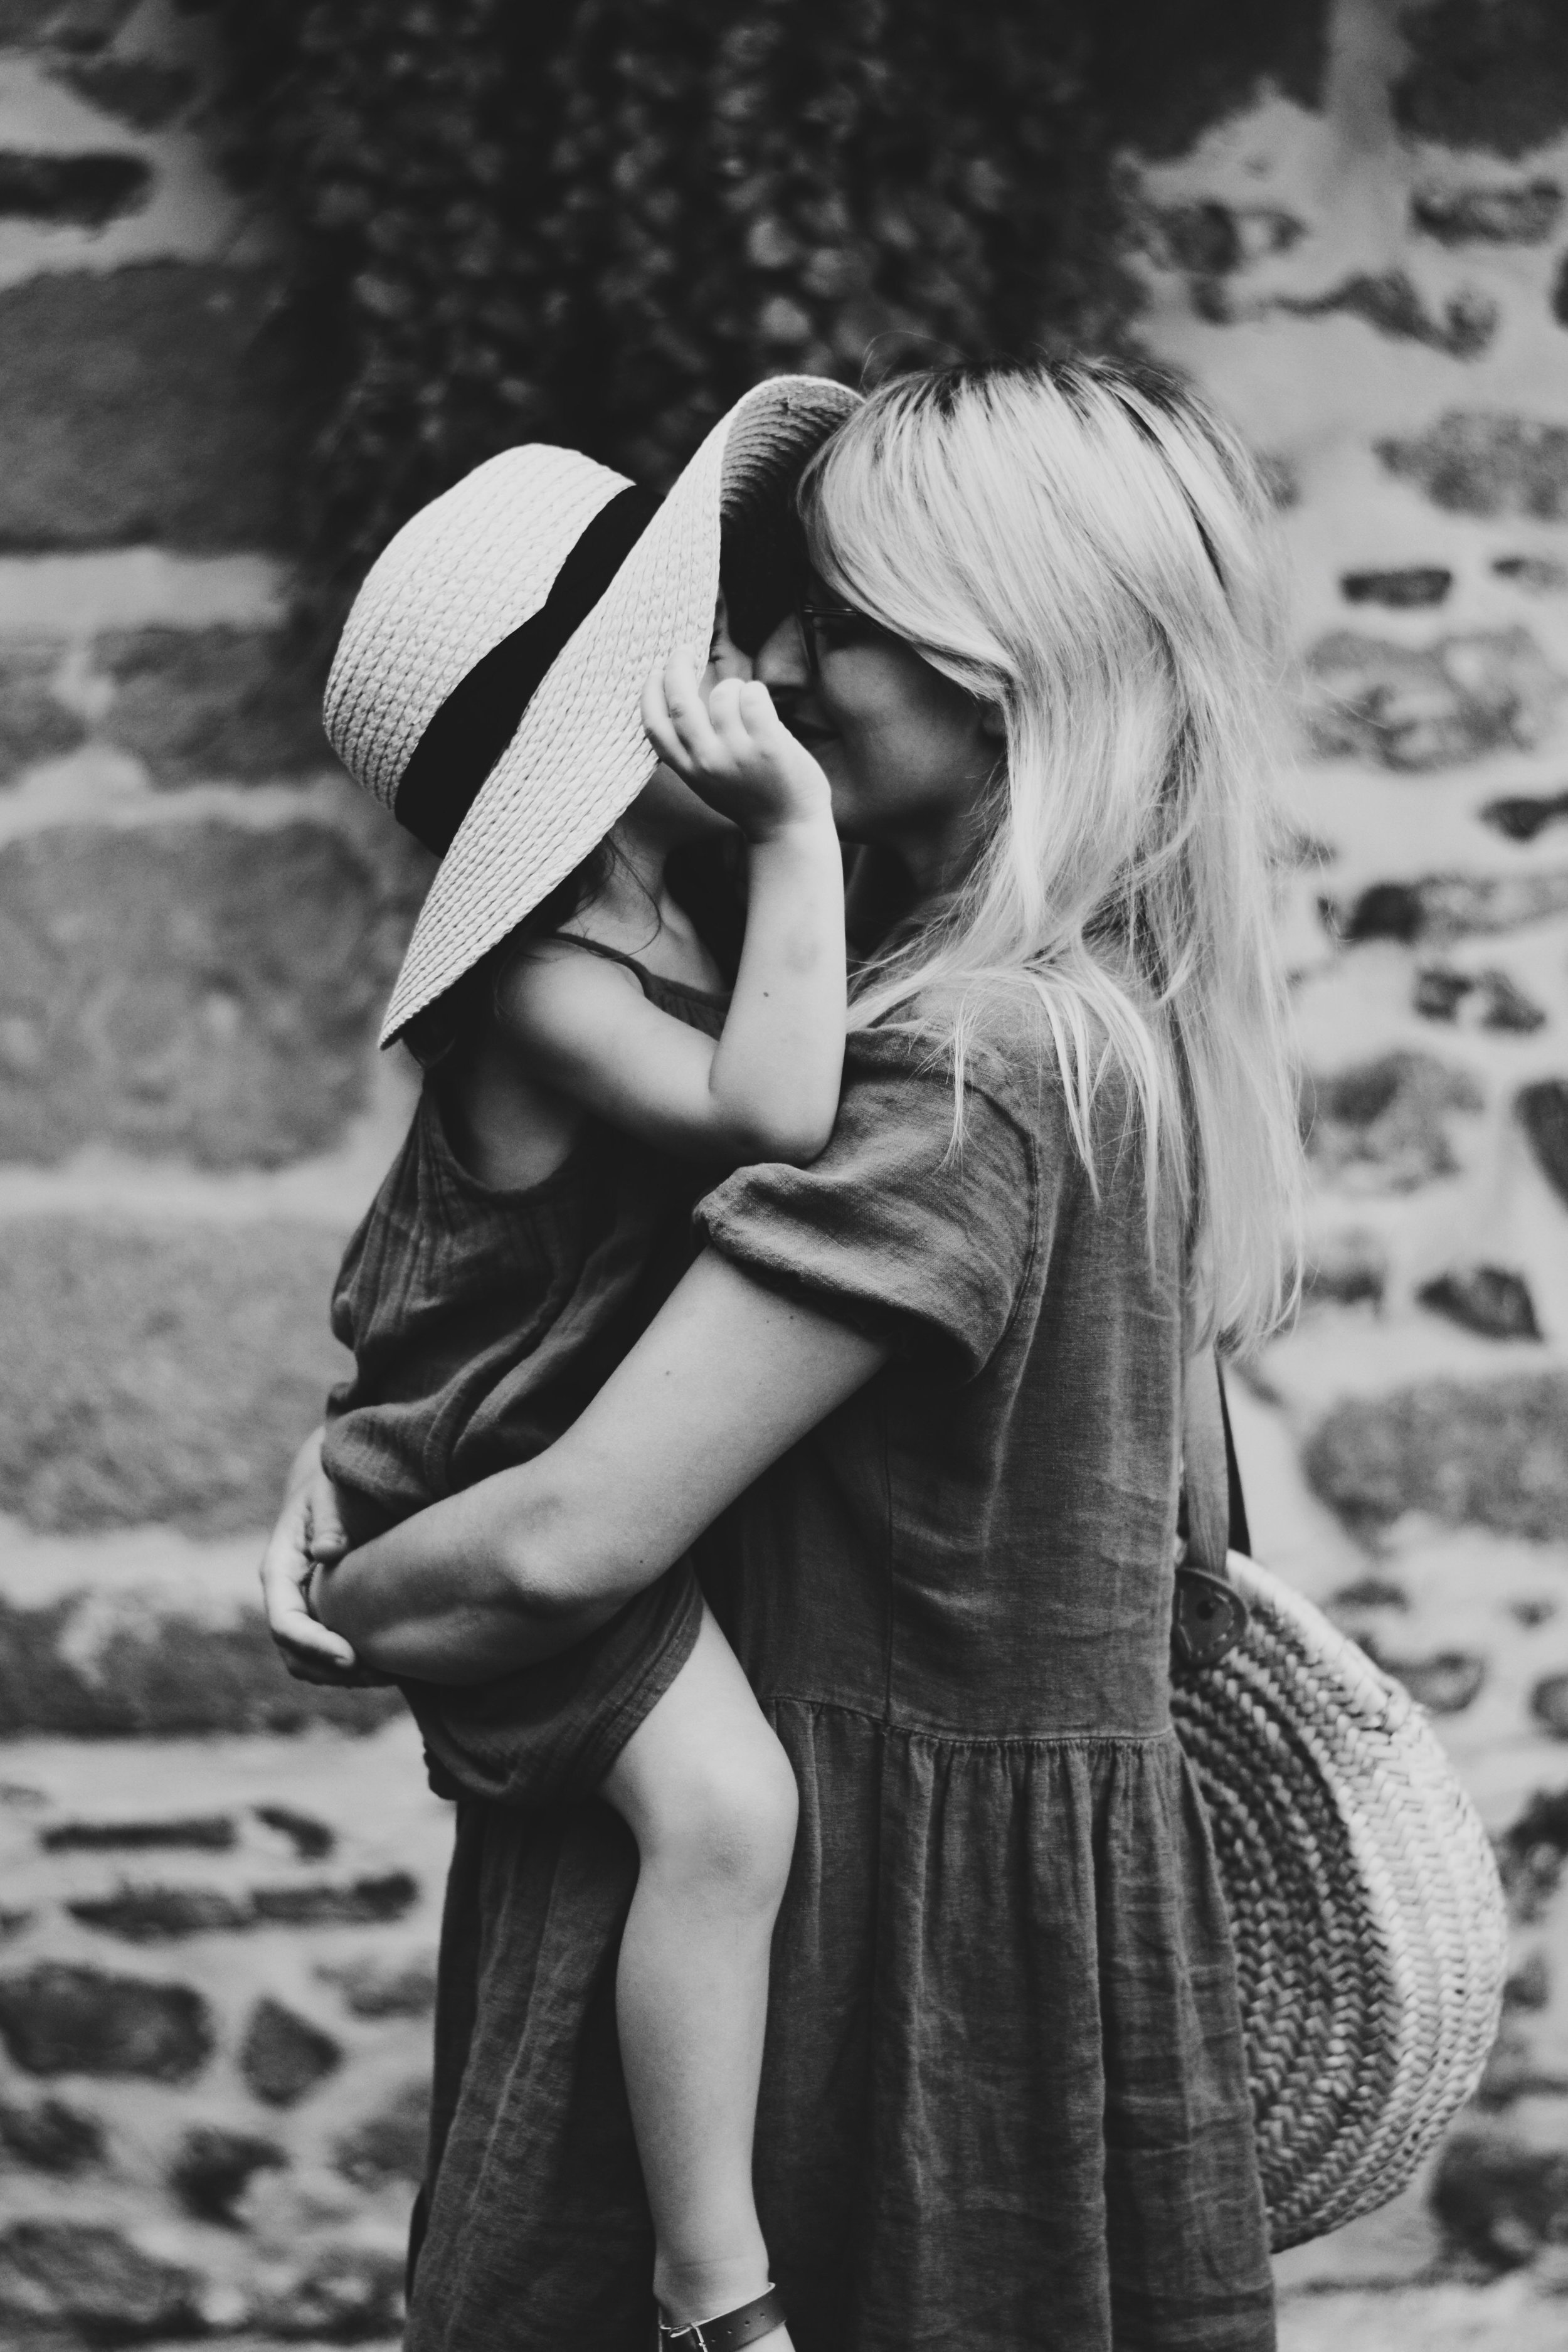 motheranddaughter b.w.jpg